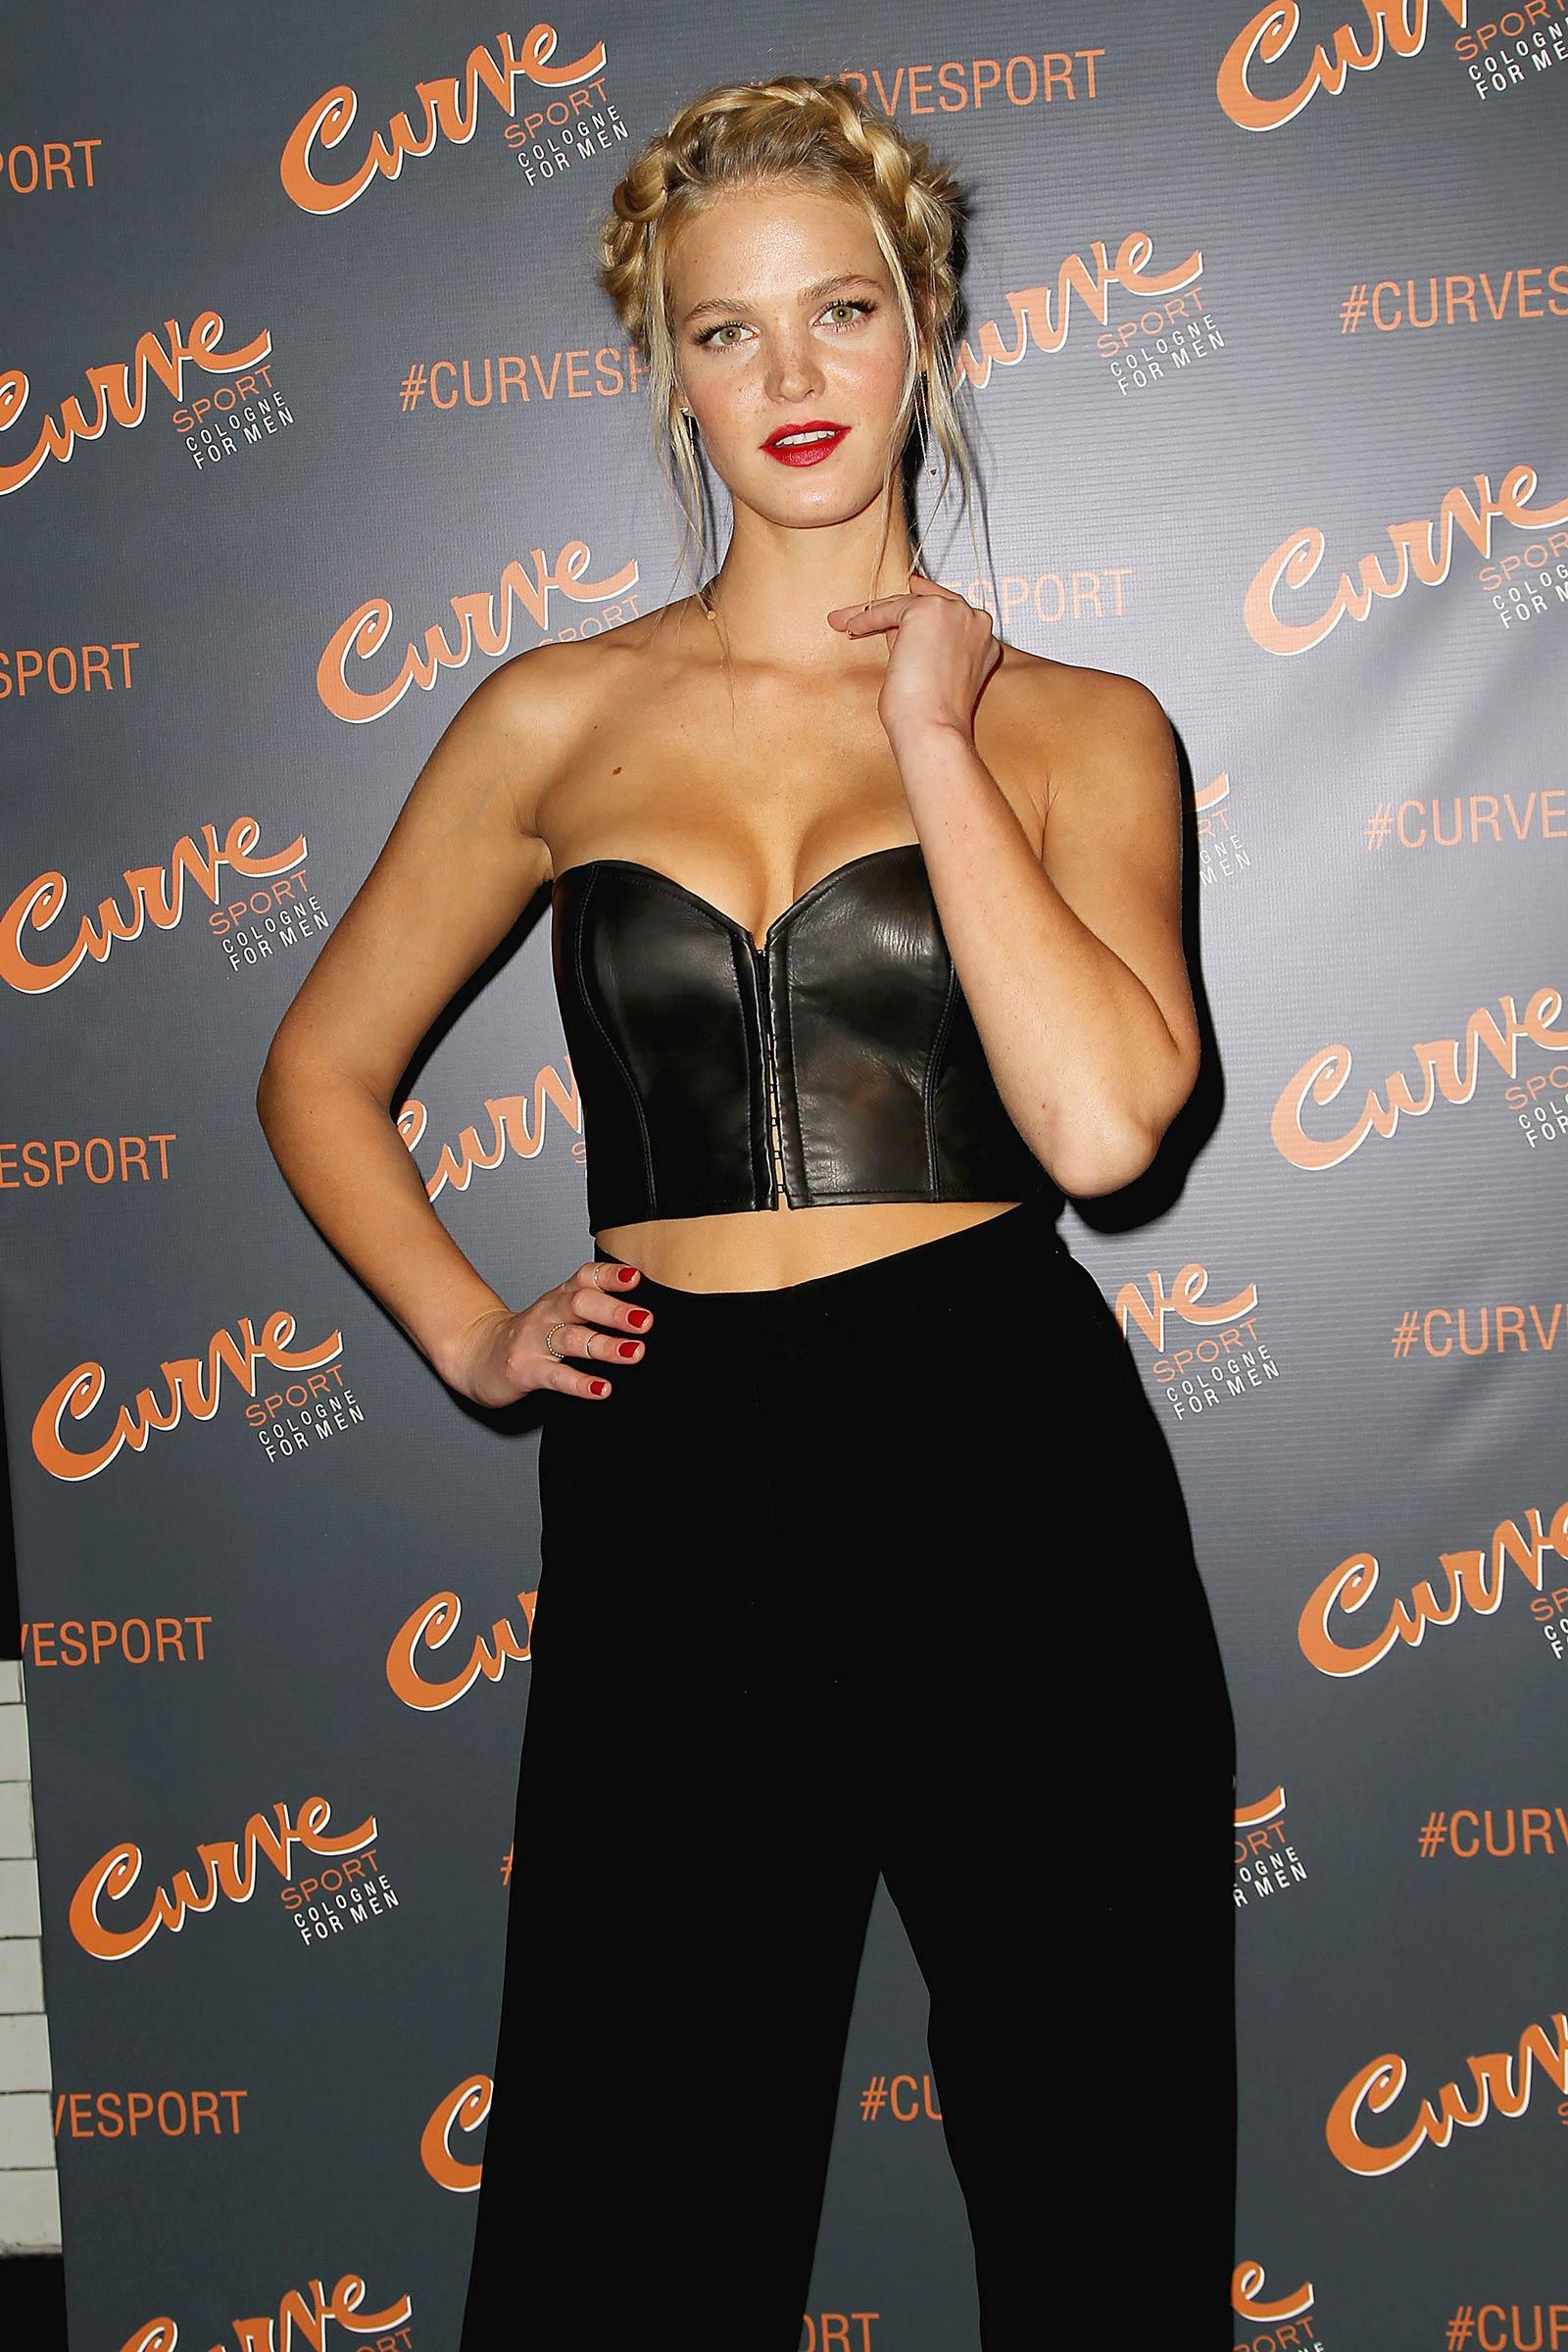 Erin Heatherton attends Curve Sport Launch Party